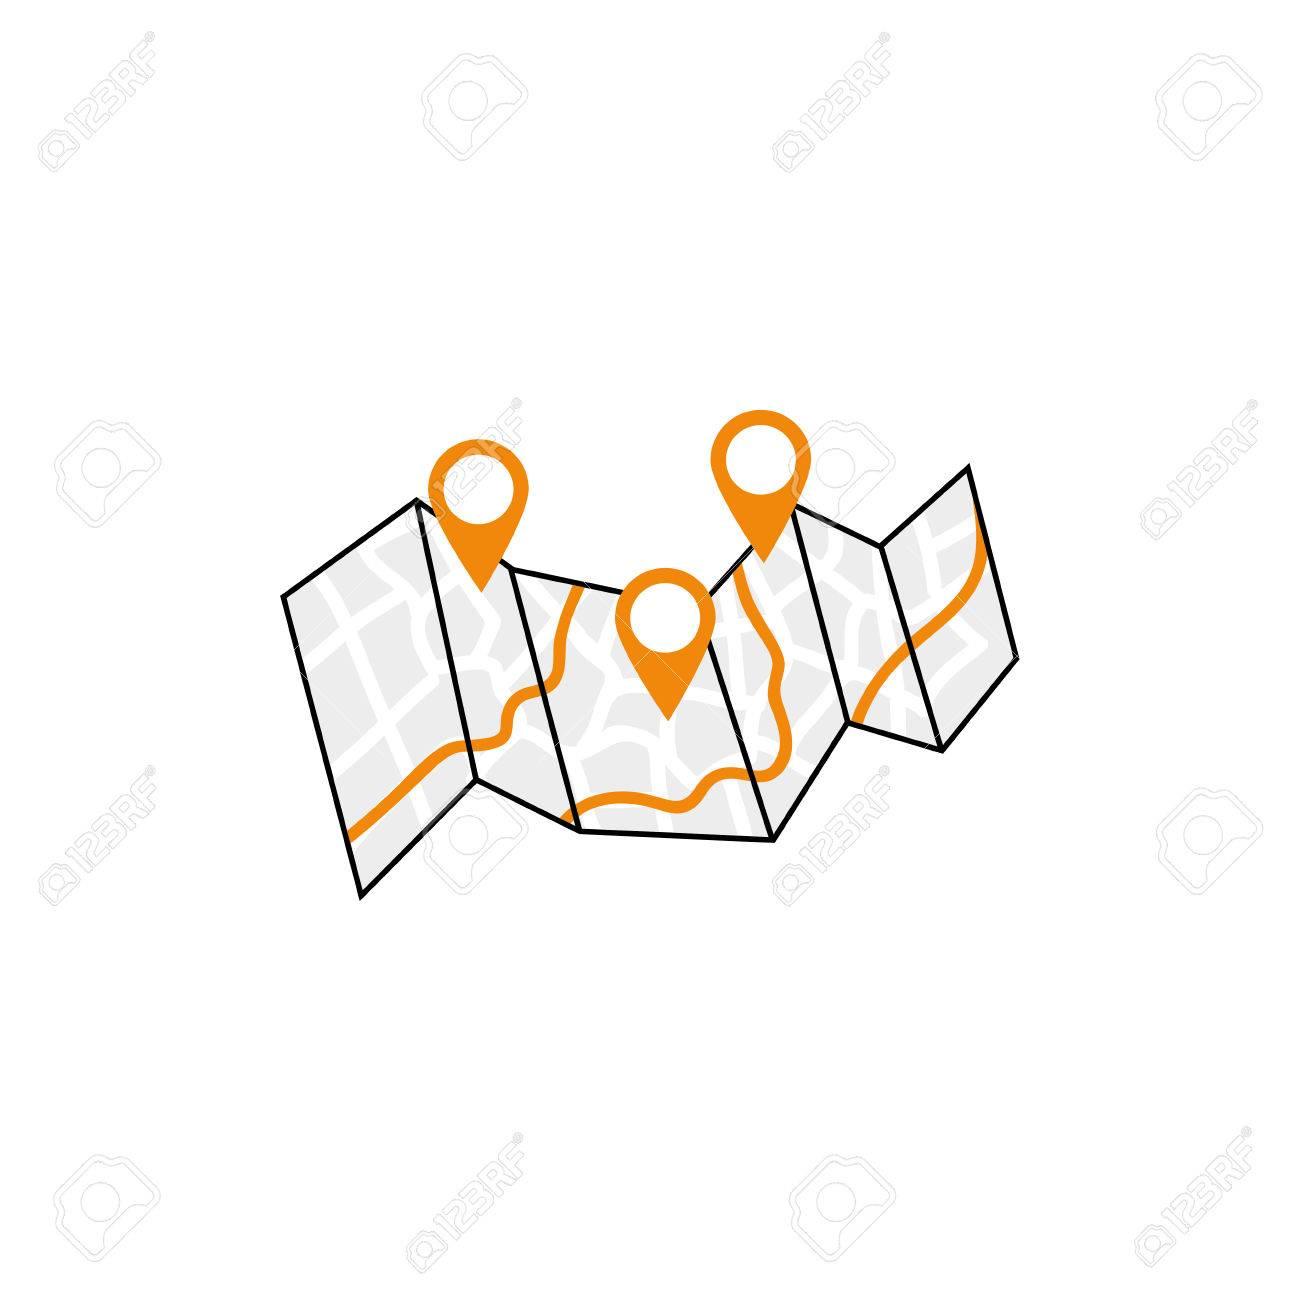 city map location icon vector illustration graphic design royalty